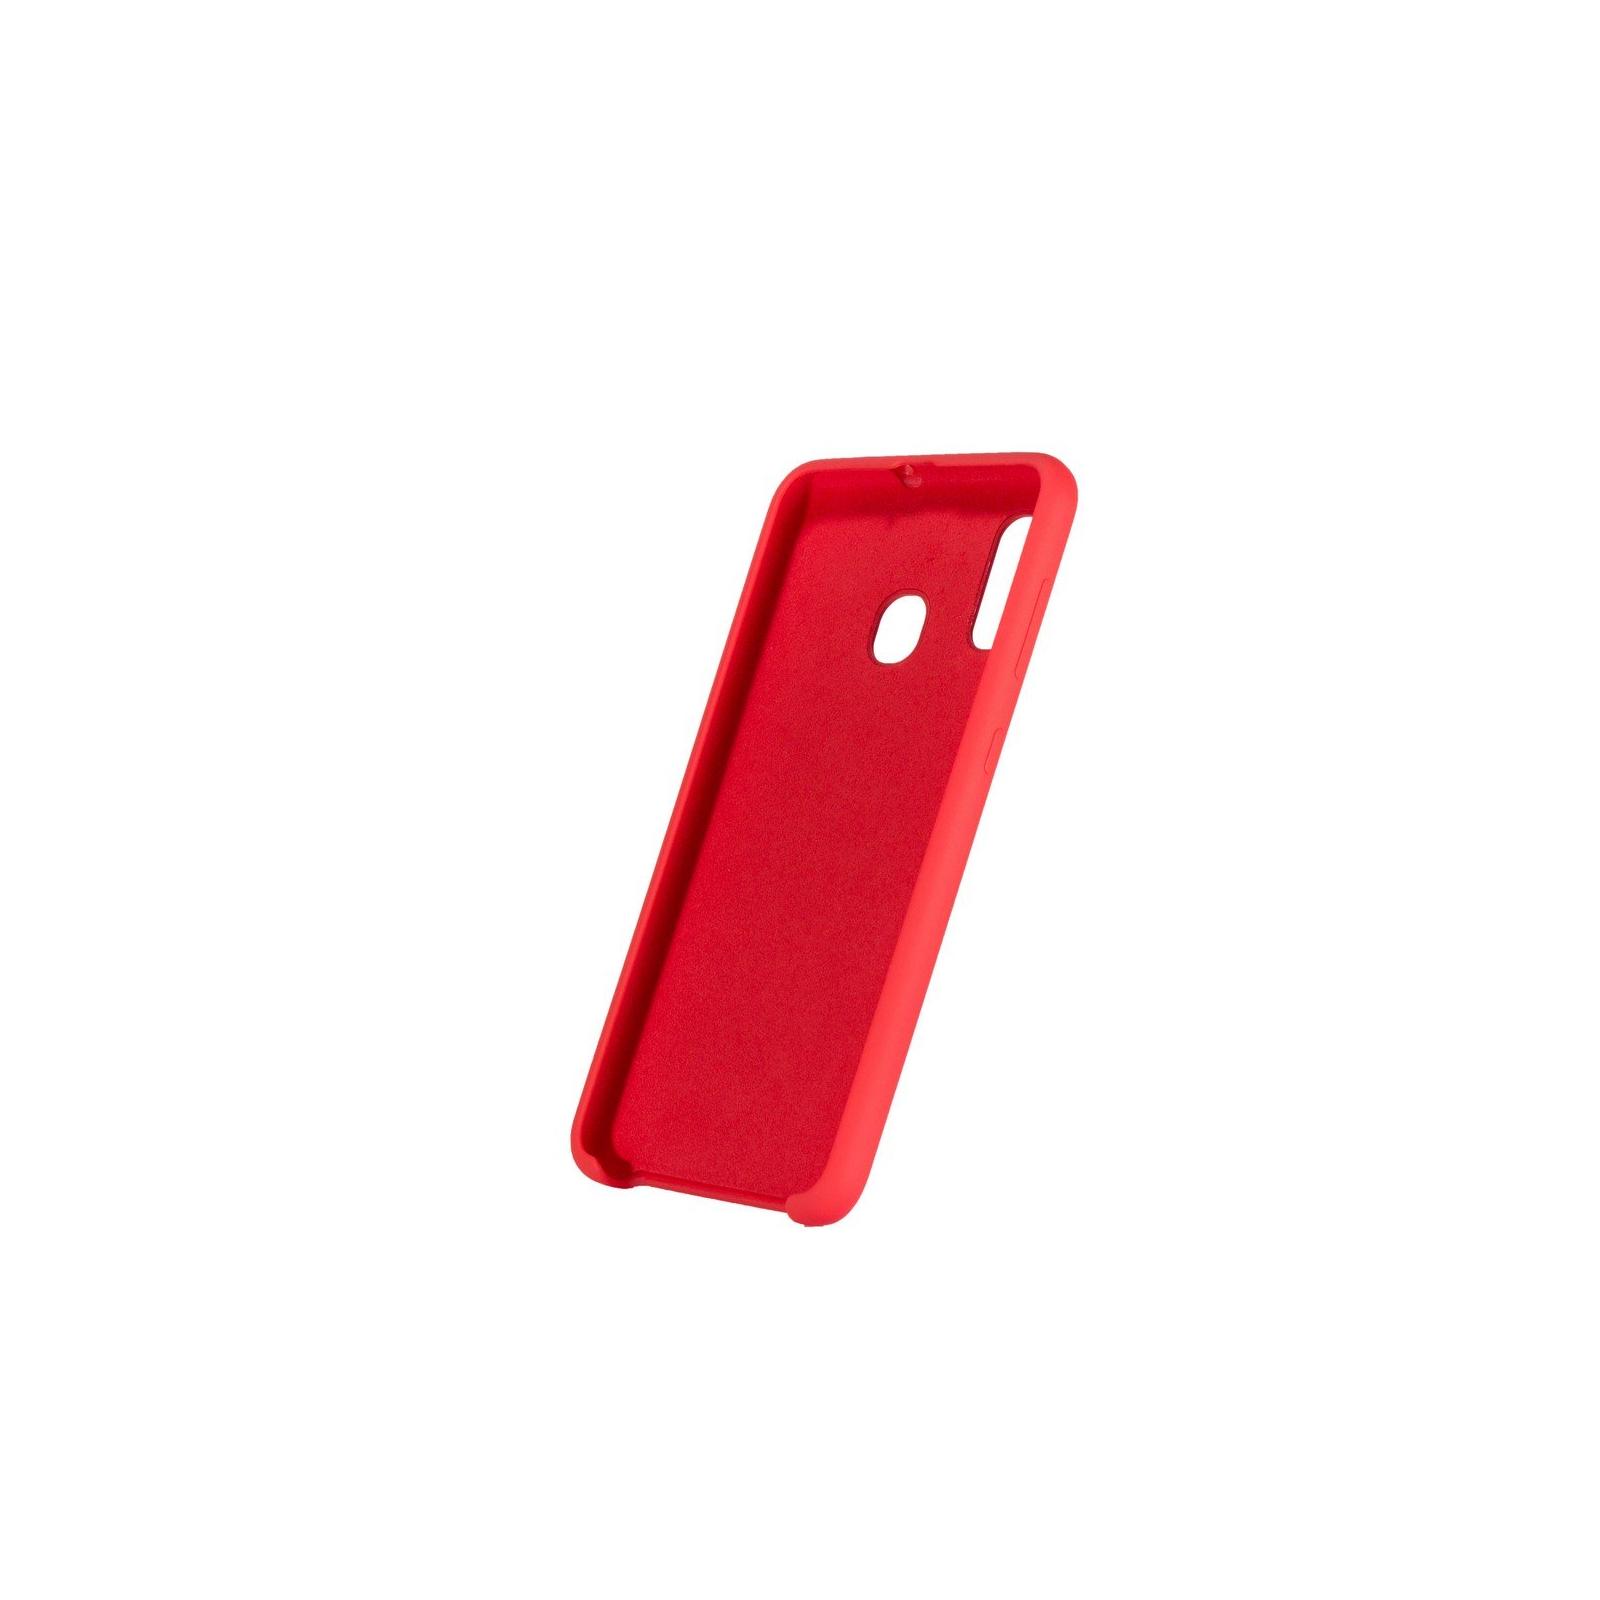 Чехол для моб. телефона ColorWay ColorWay Liquid Silicone для Samsung Galaxy A30 Red (CW-CLSSGA305-RD) изображение 3